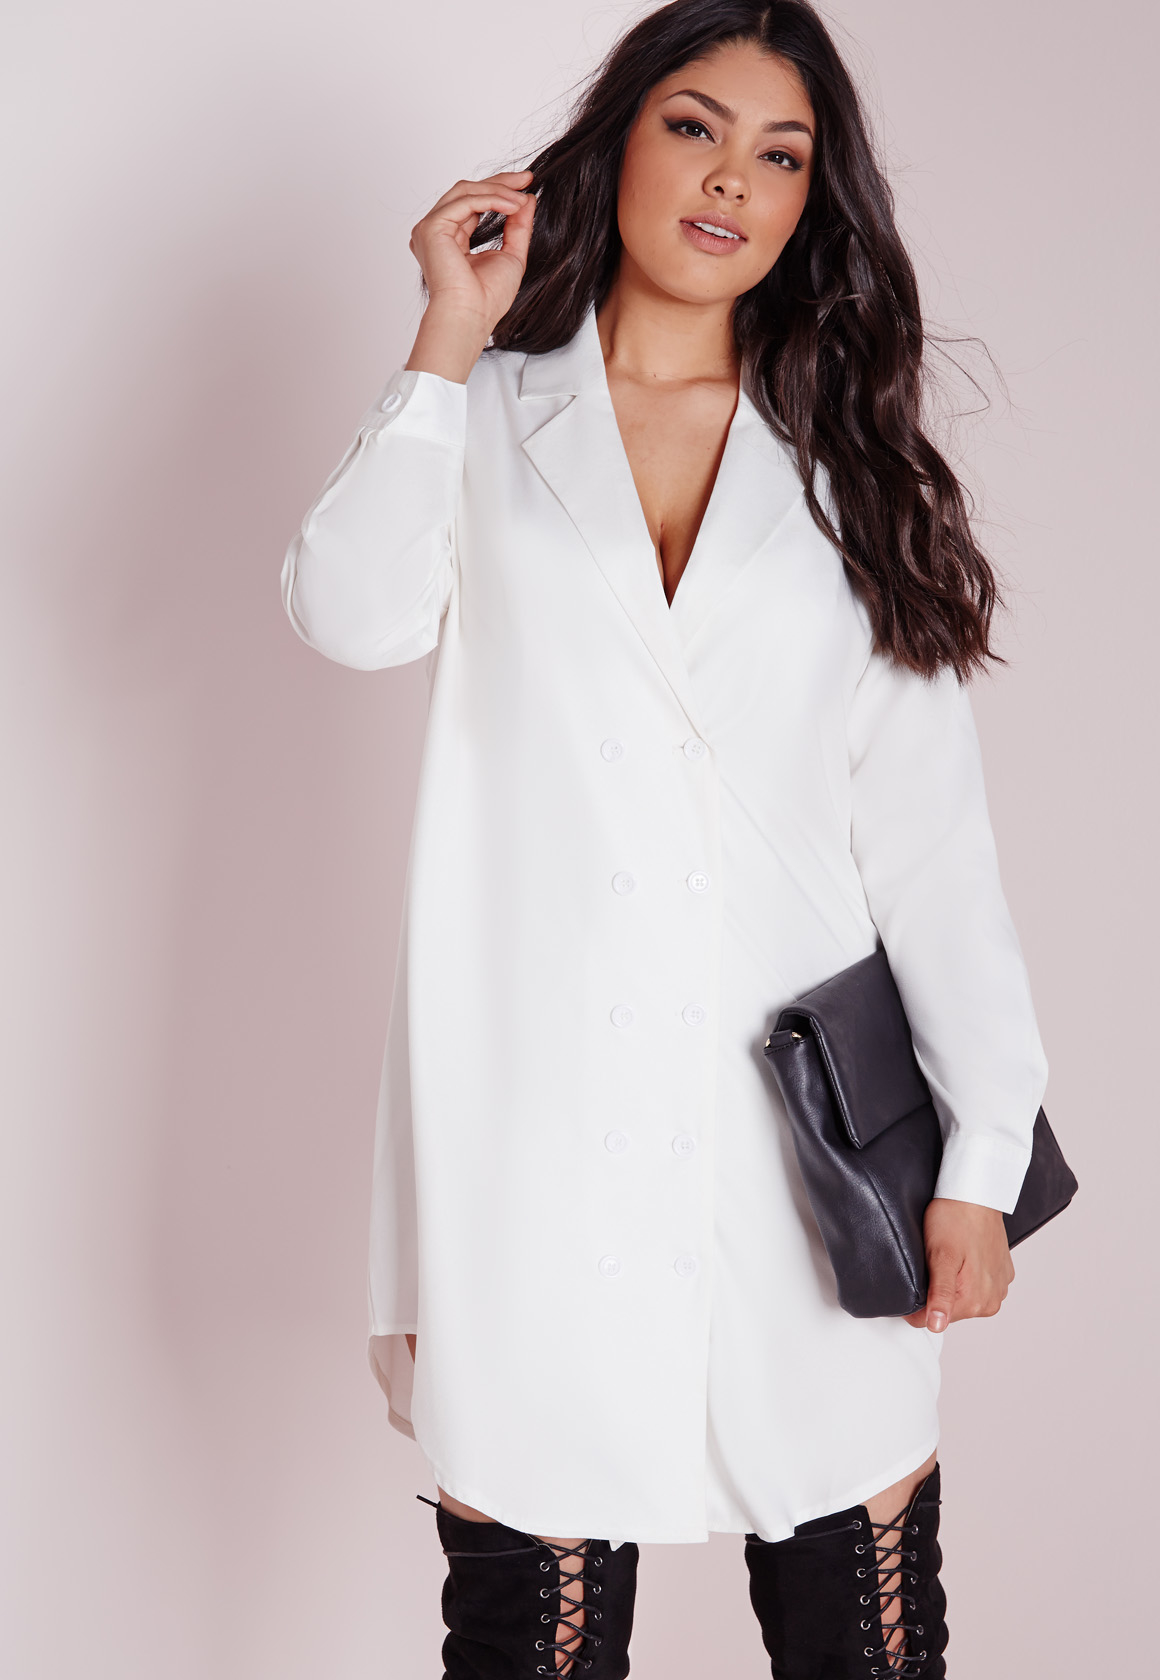 fb09d6c3958 Missguided Plus Size Tuxedo Shirt Dress White in White - Lyst